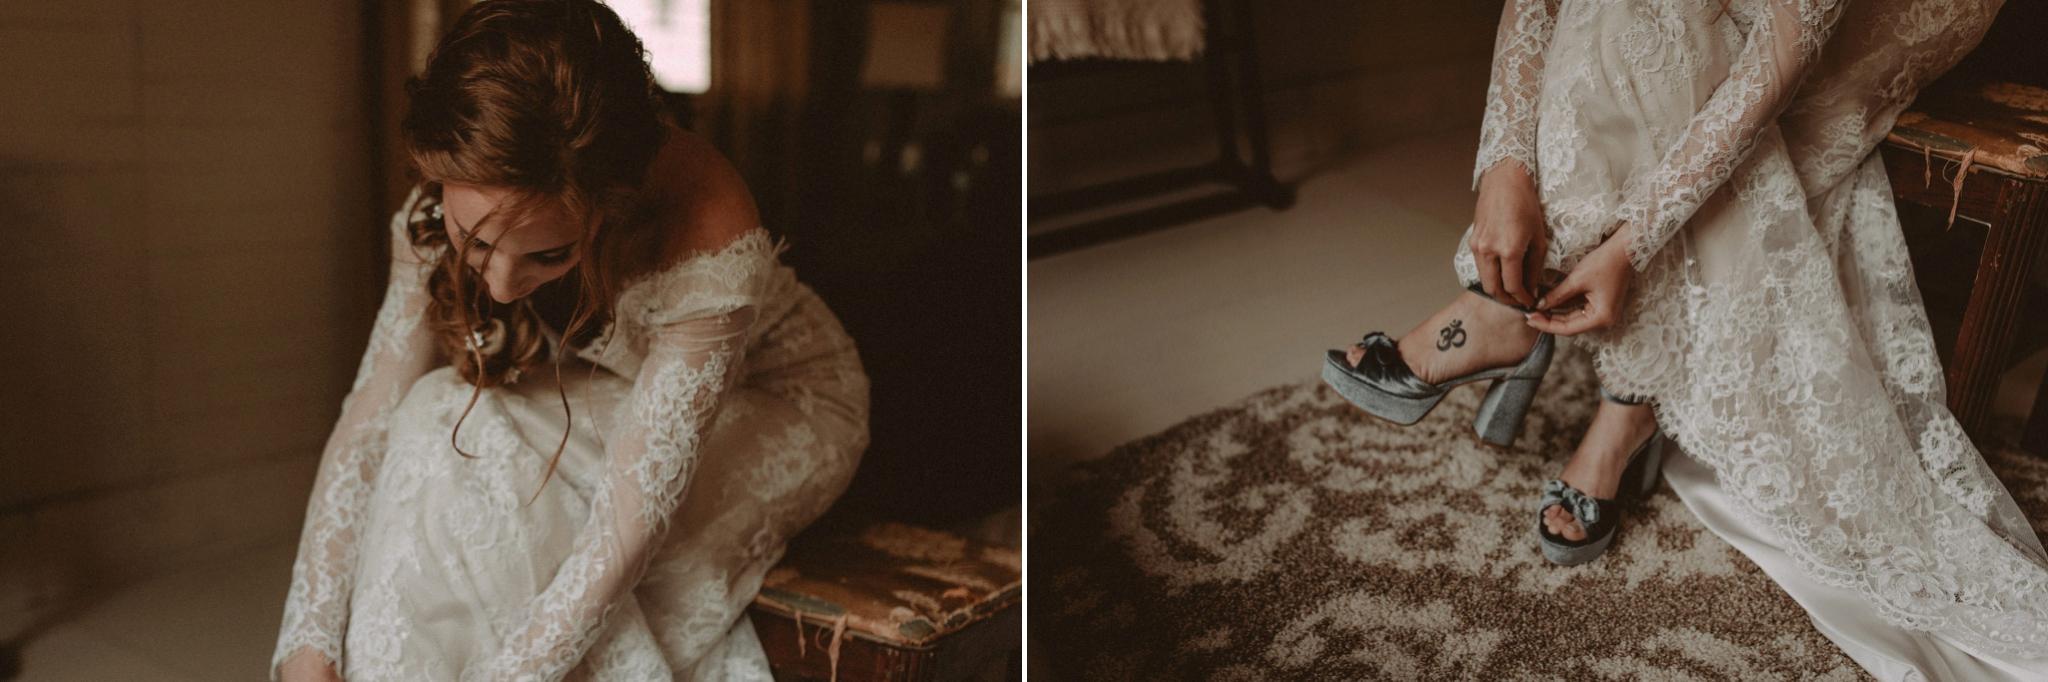 Kerlyn-Van-Gelder-Photography-Corpus-Christi-Photographer_0077.jpg